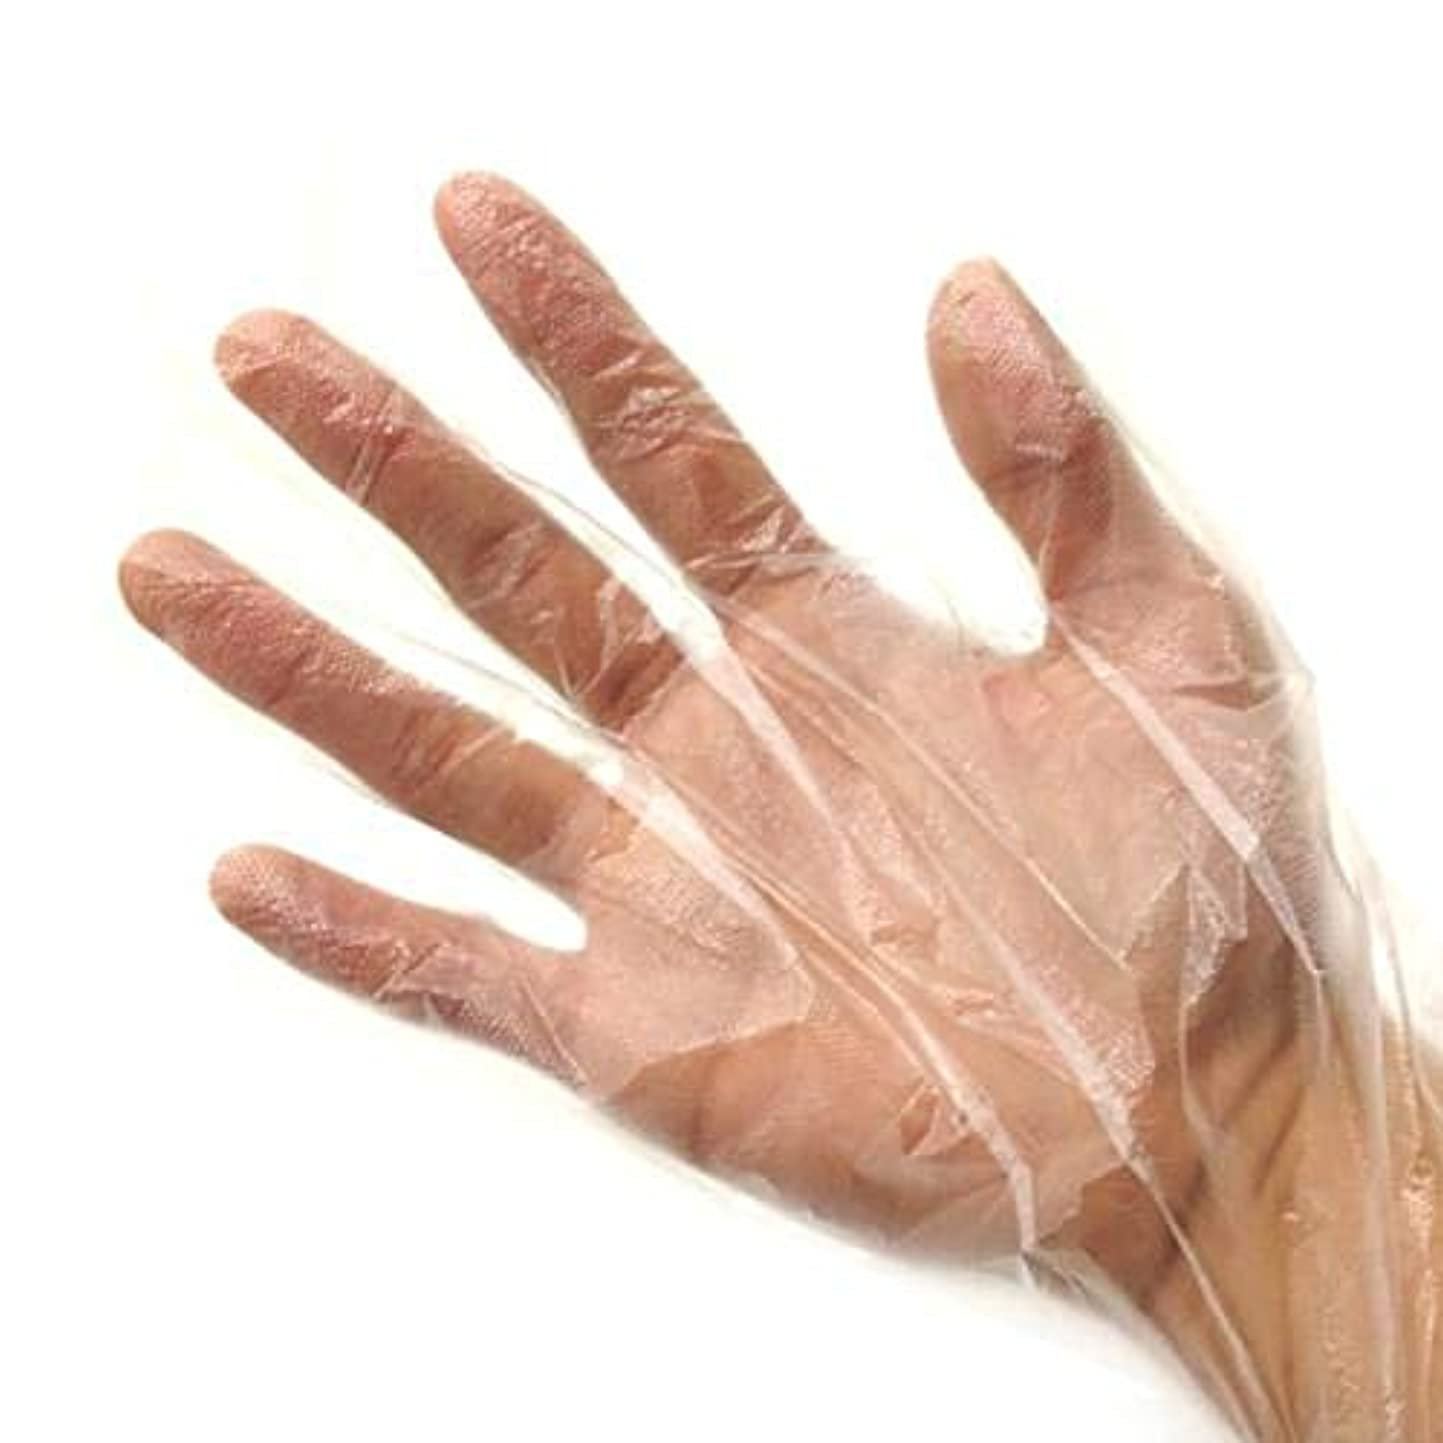 食欲取得懐疑論使い捨て手袋 極薄ビニール手袋 調理 透明 実用 衛生 100枚入